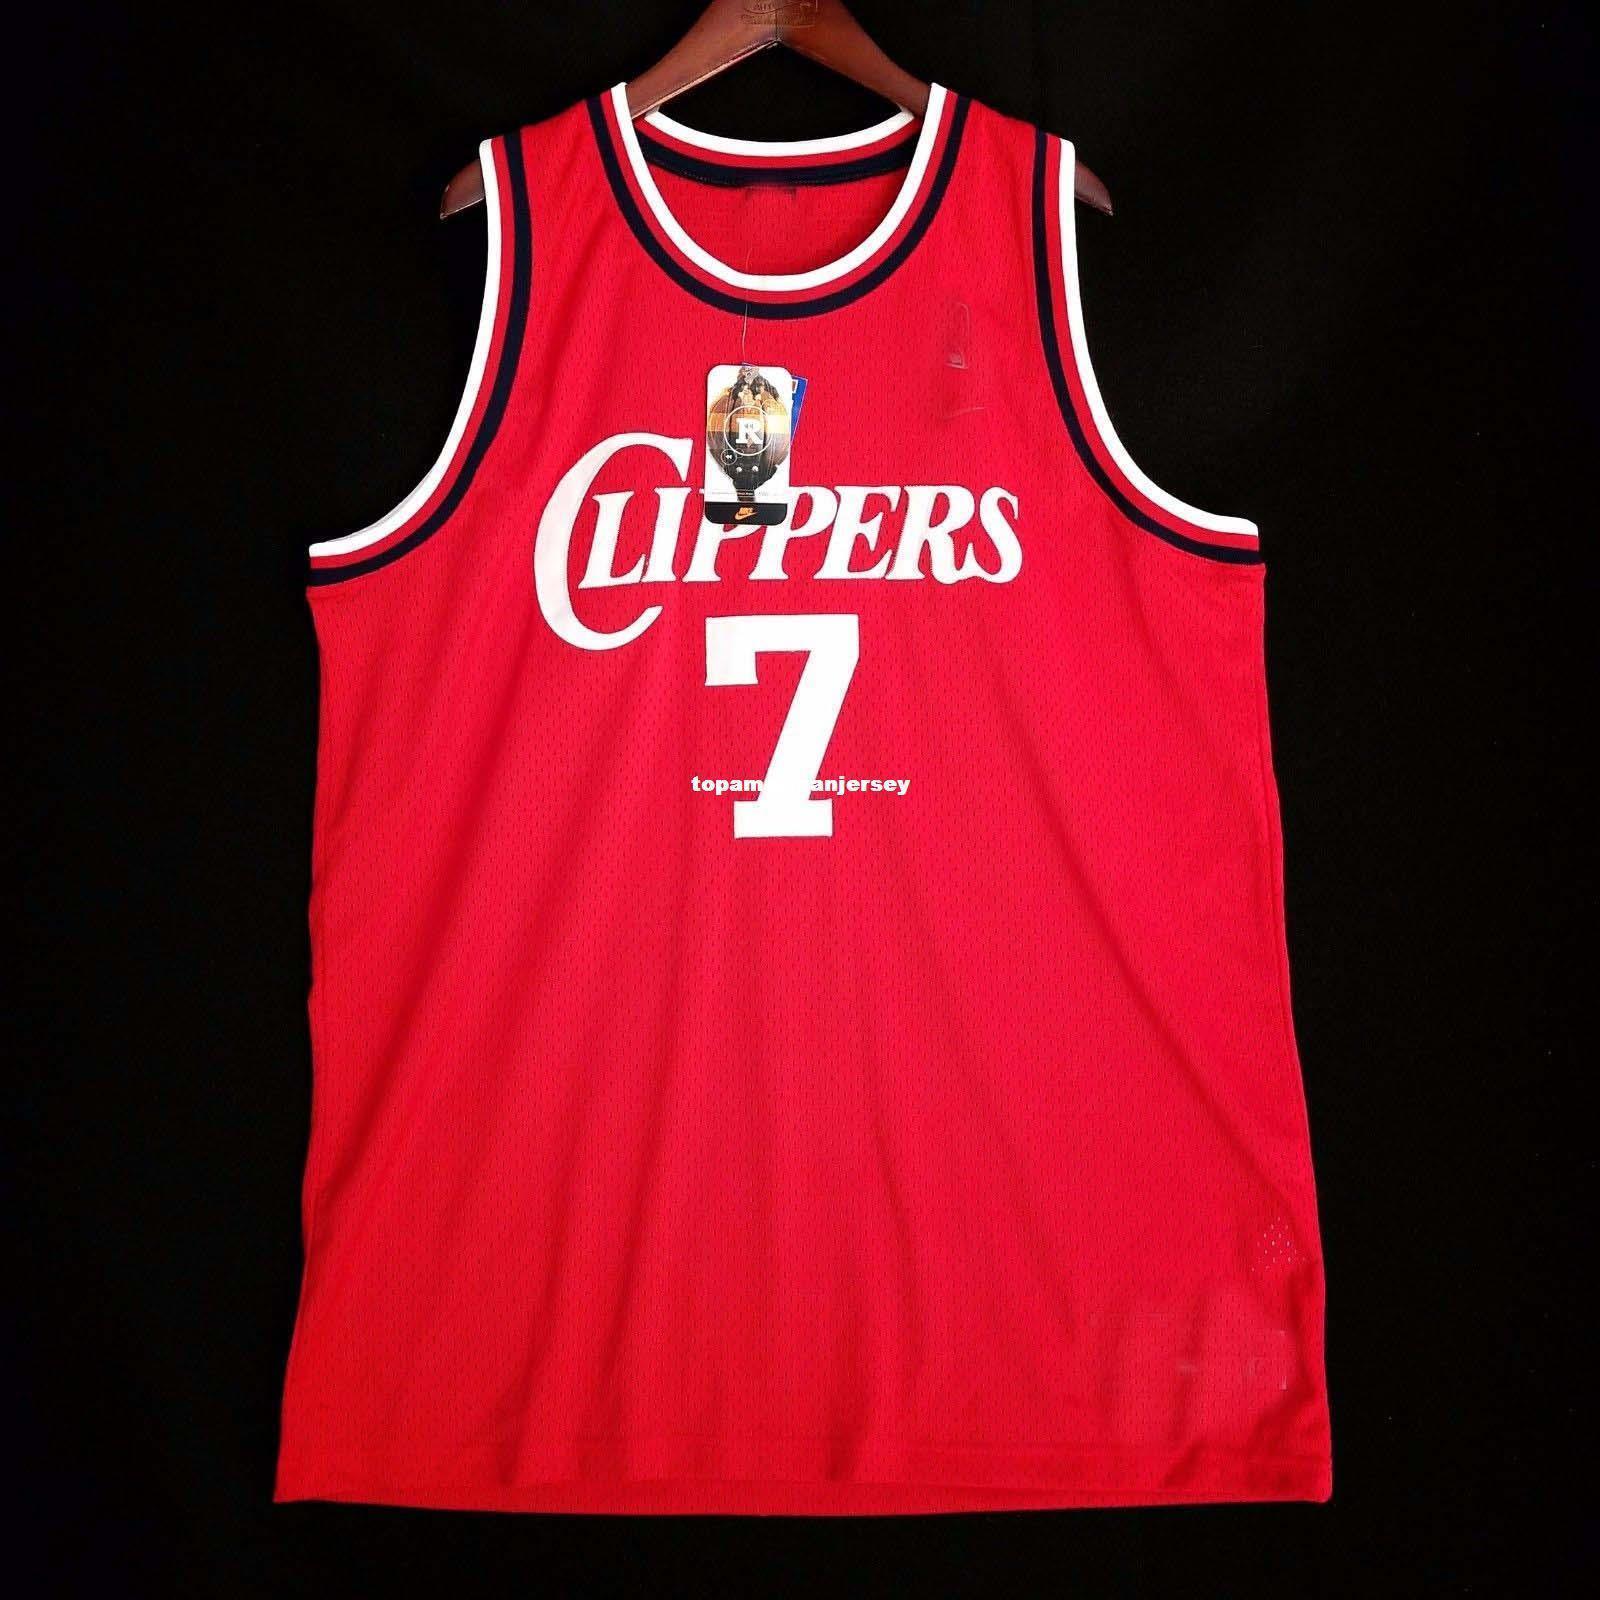 100% Stitched Lamar Odom #7 Sewn Jersey Red blake griffin Mens Vest Size XS-6XL Stitched basketball Jerseys Ncaa